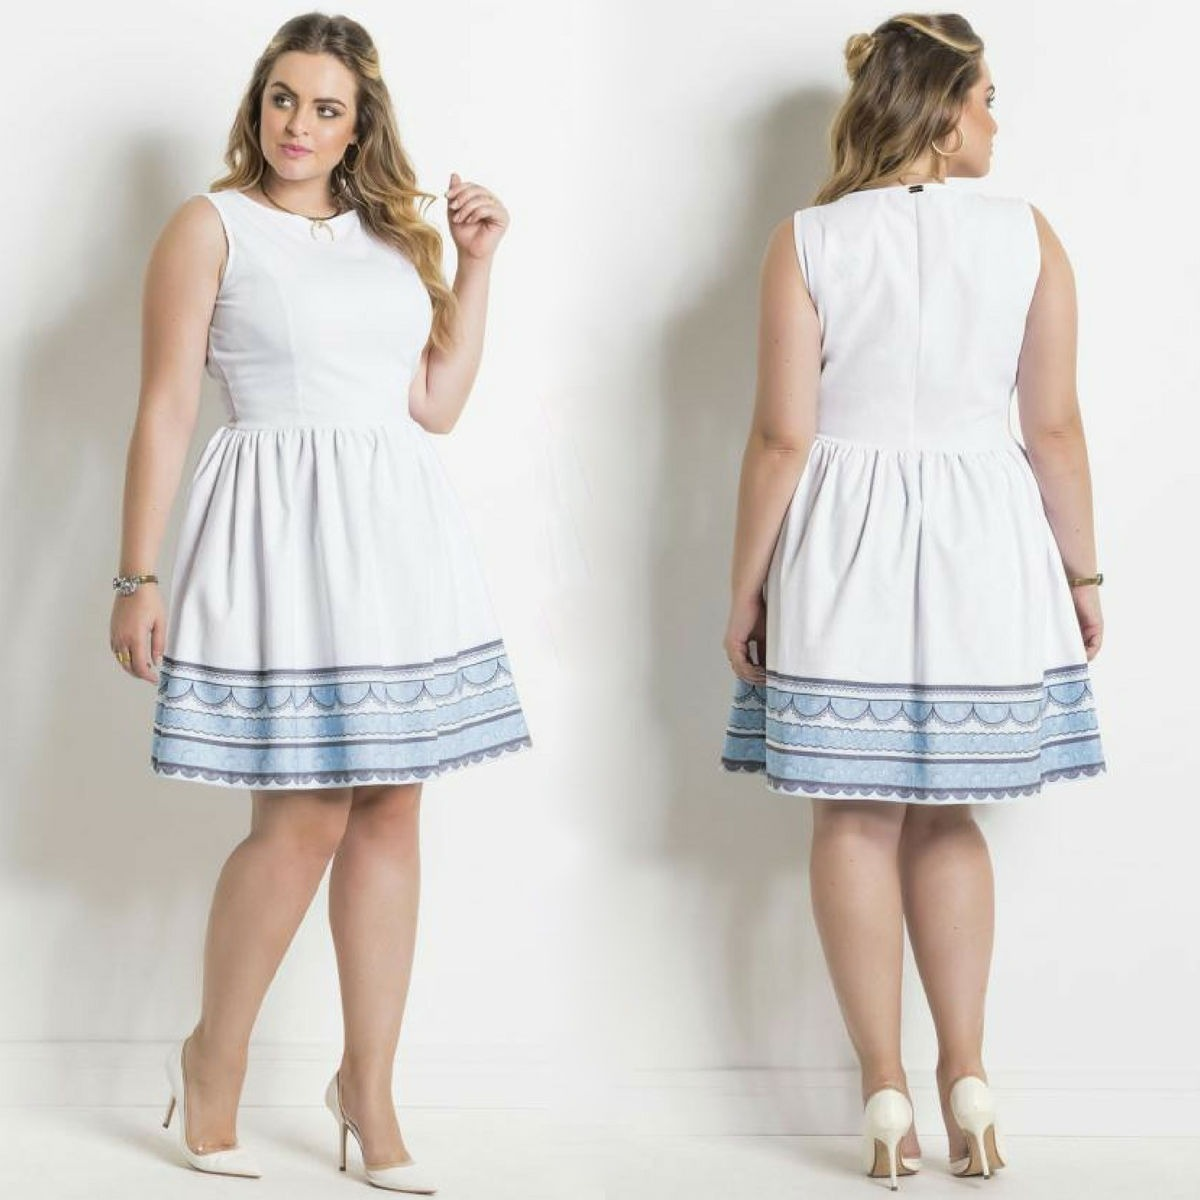 cfc1e3b99 vestido rodado curto de festa lindo moda plus size feminina. Carregando zoom .